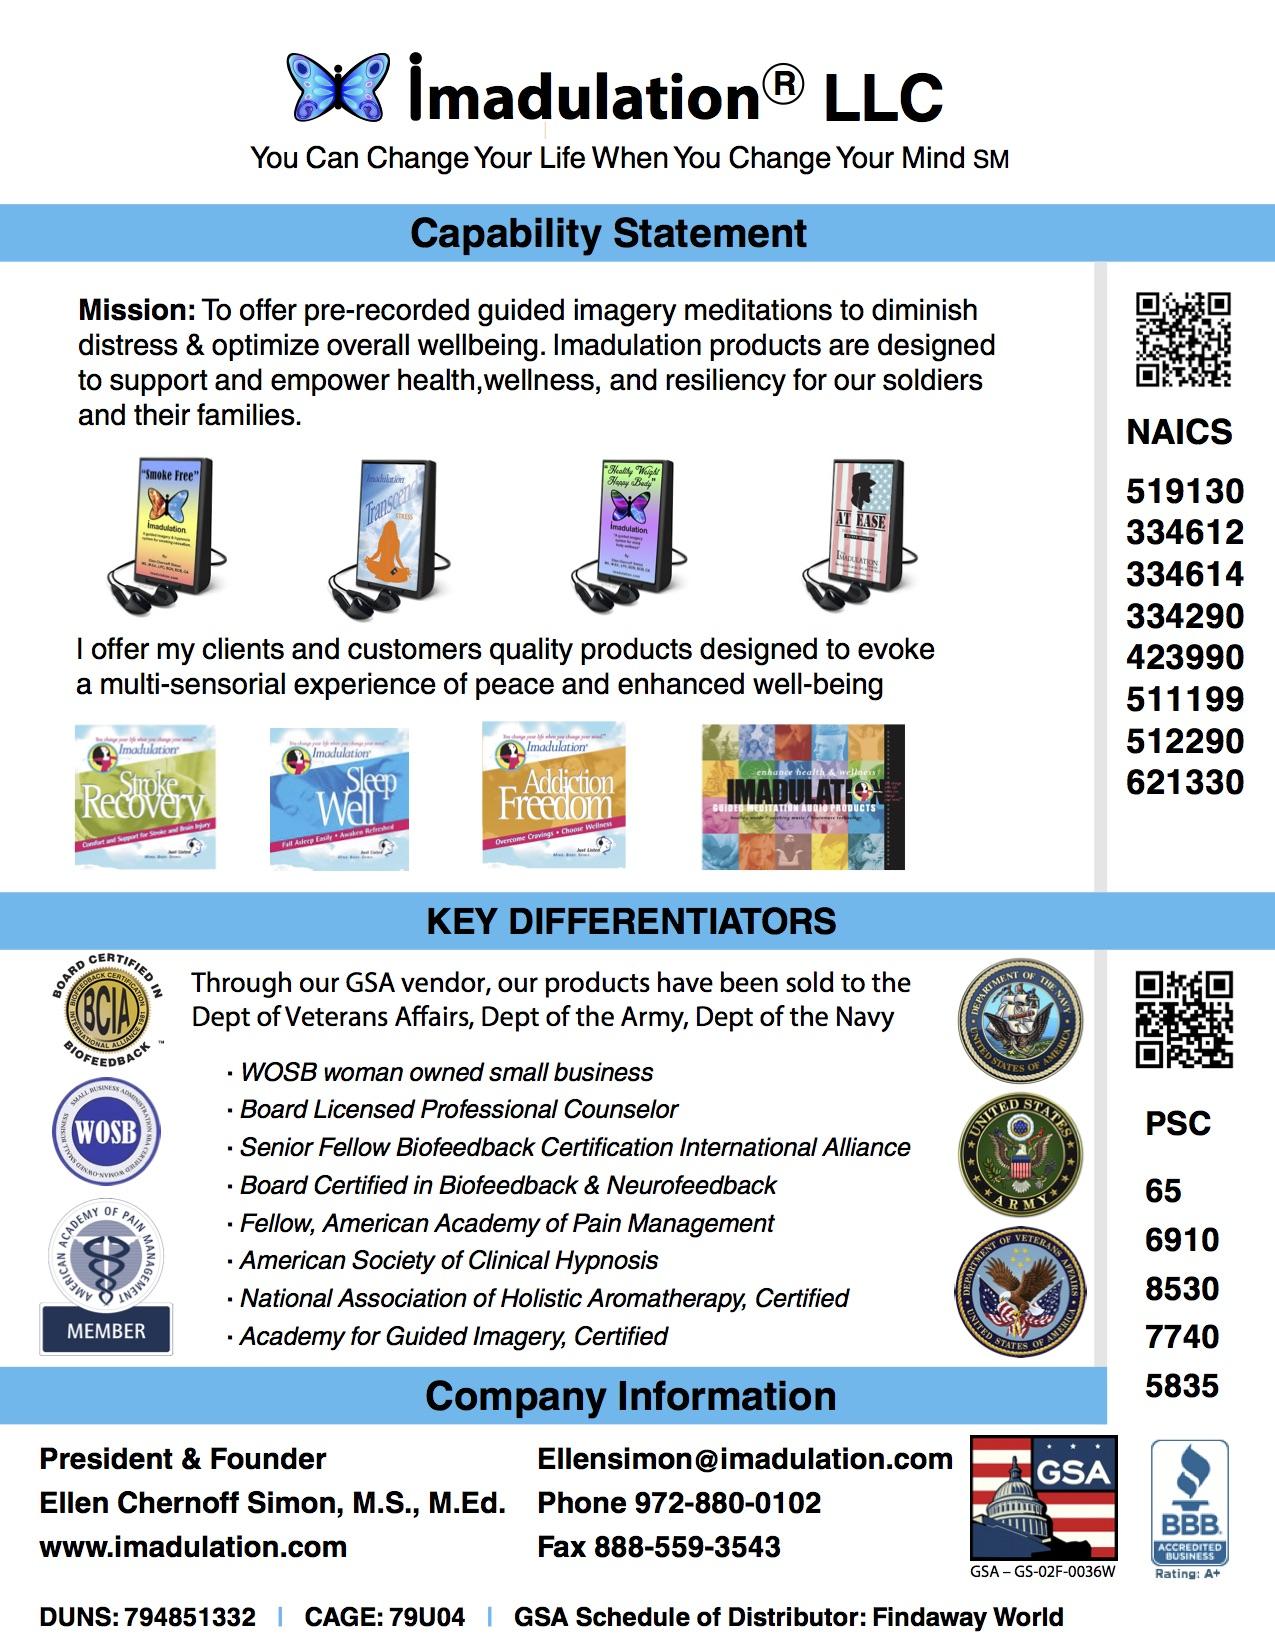 capability-statement-9-1-17.jpg